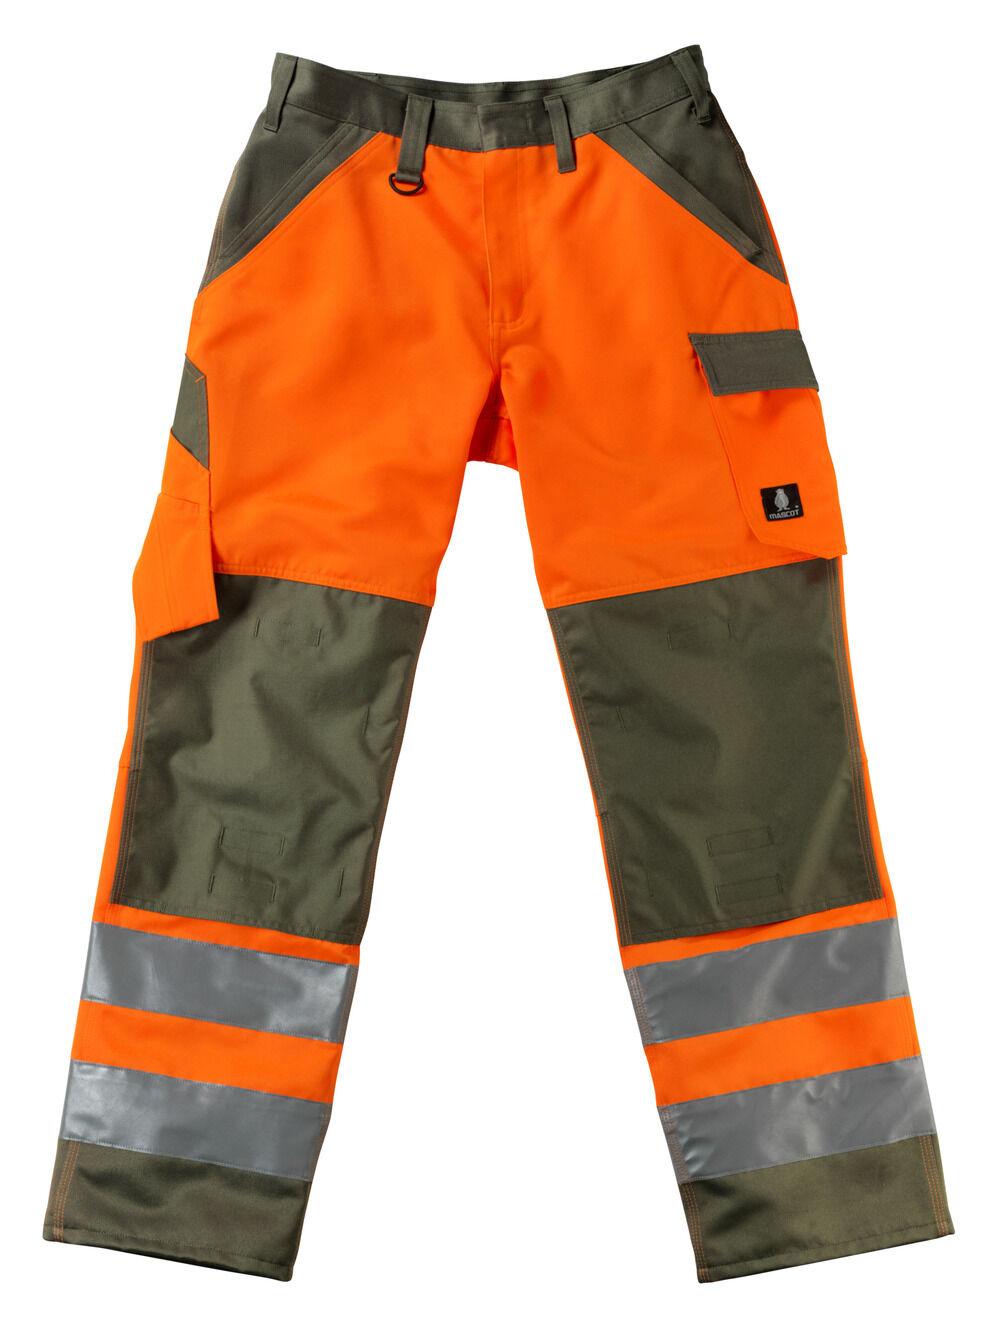 MASCOT WORKWEAR WORKWEAR WORKWEAR Maitland Pantaloni da lavoro e0e568